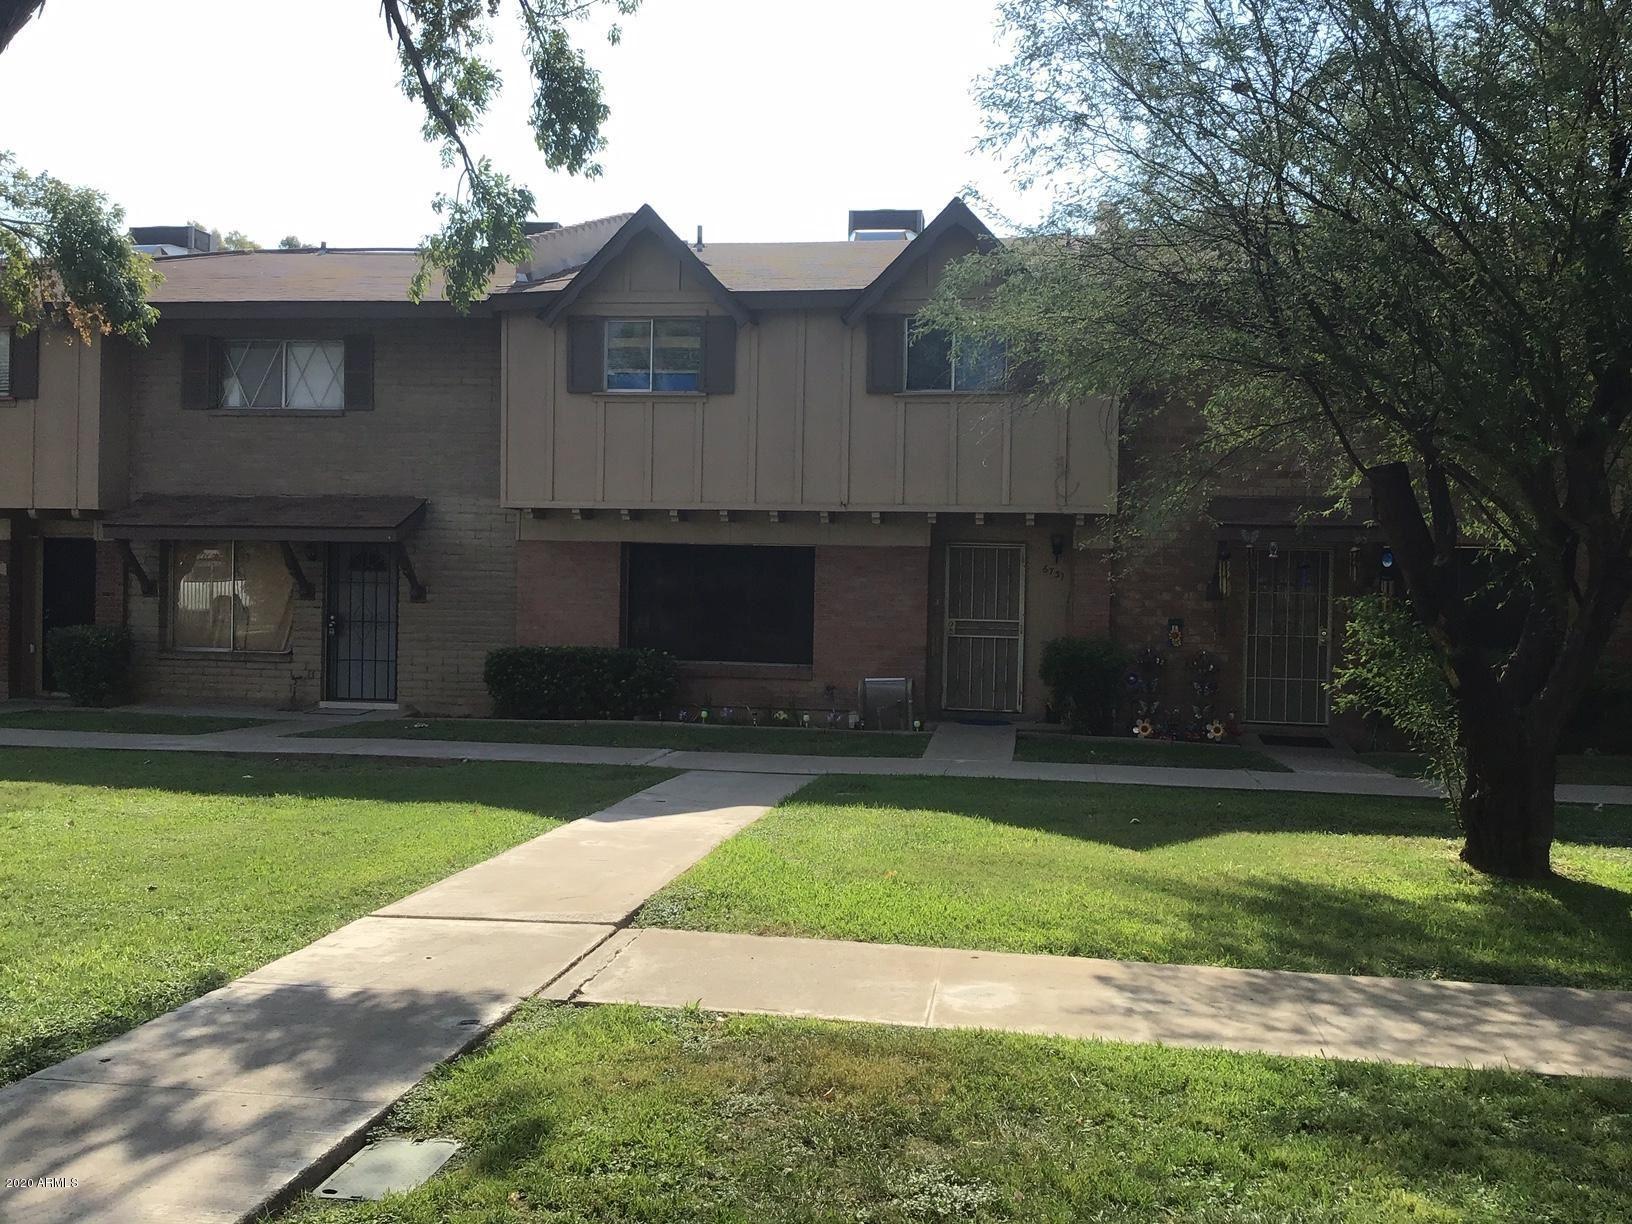 6731 N 44TH Avenue, Glendale, AZ 85301 - MLS#: 6133889